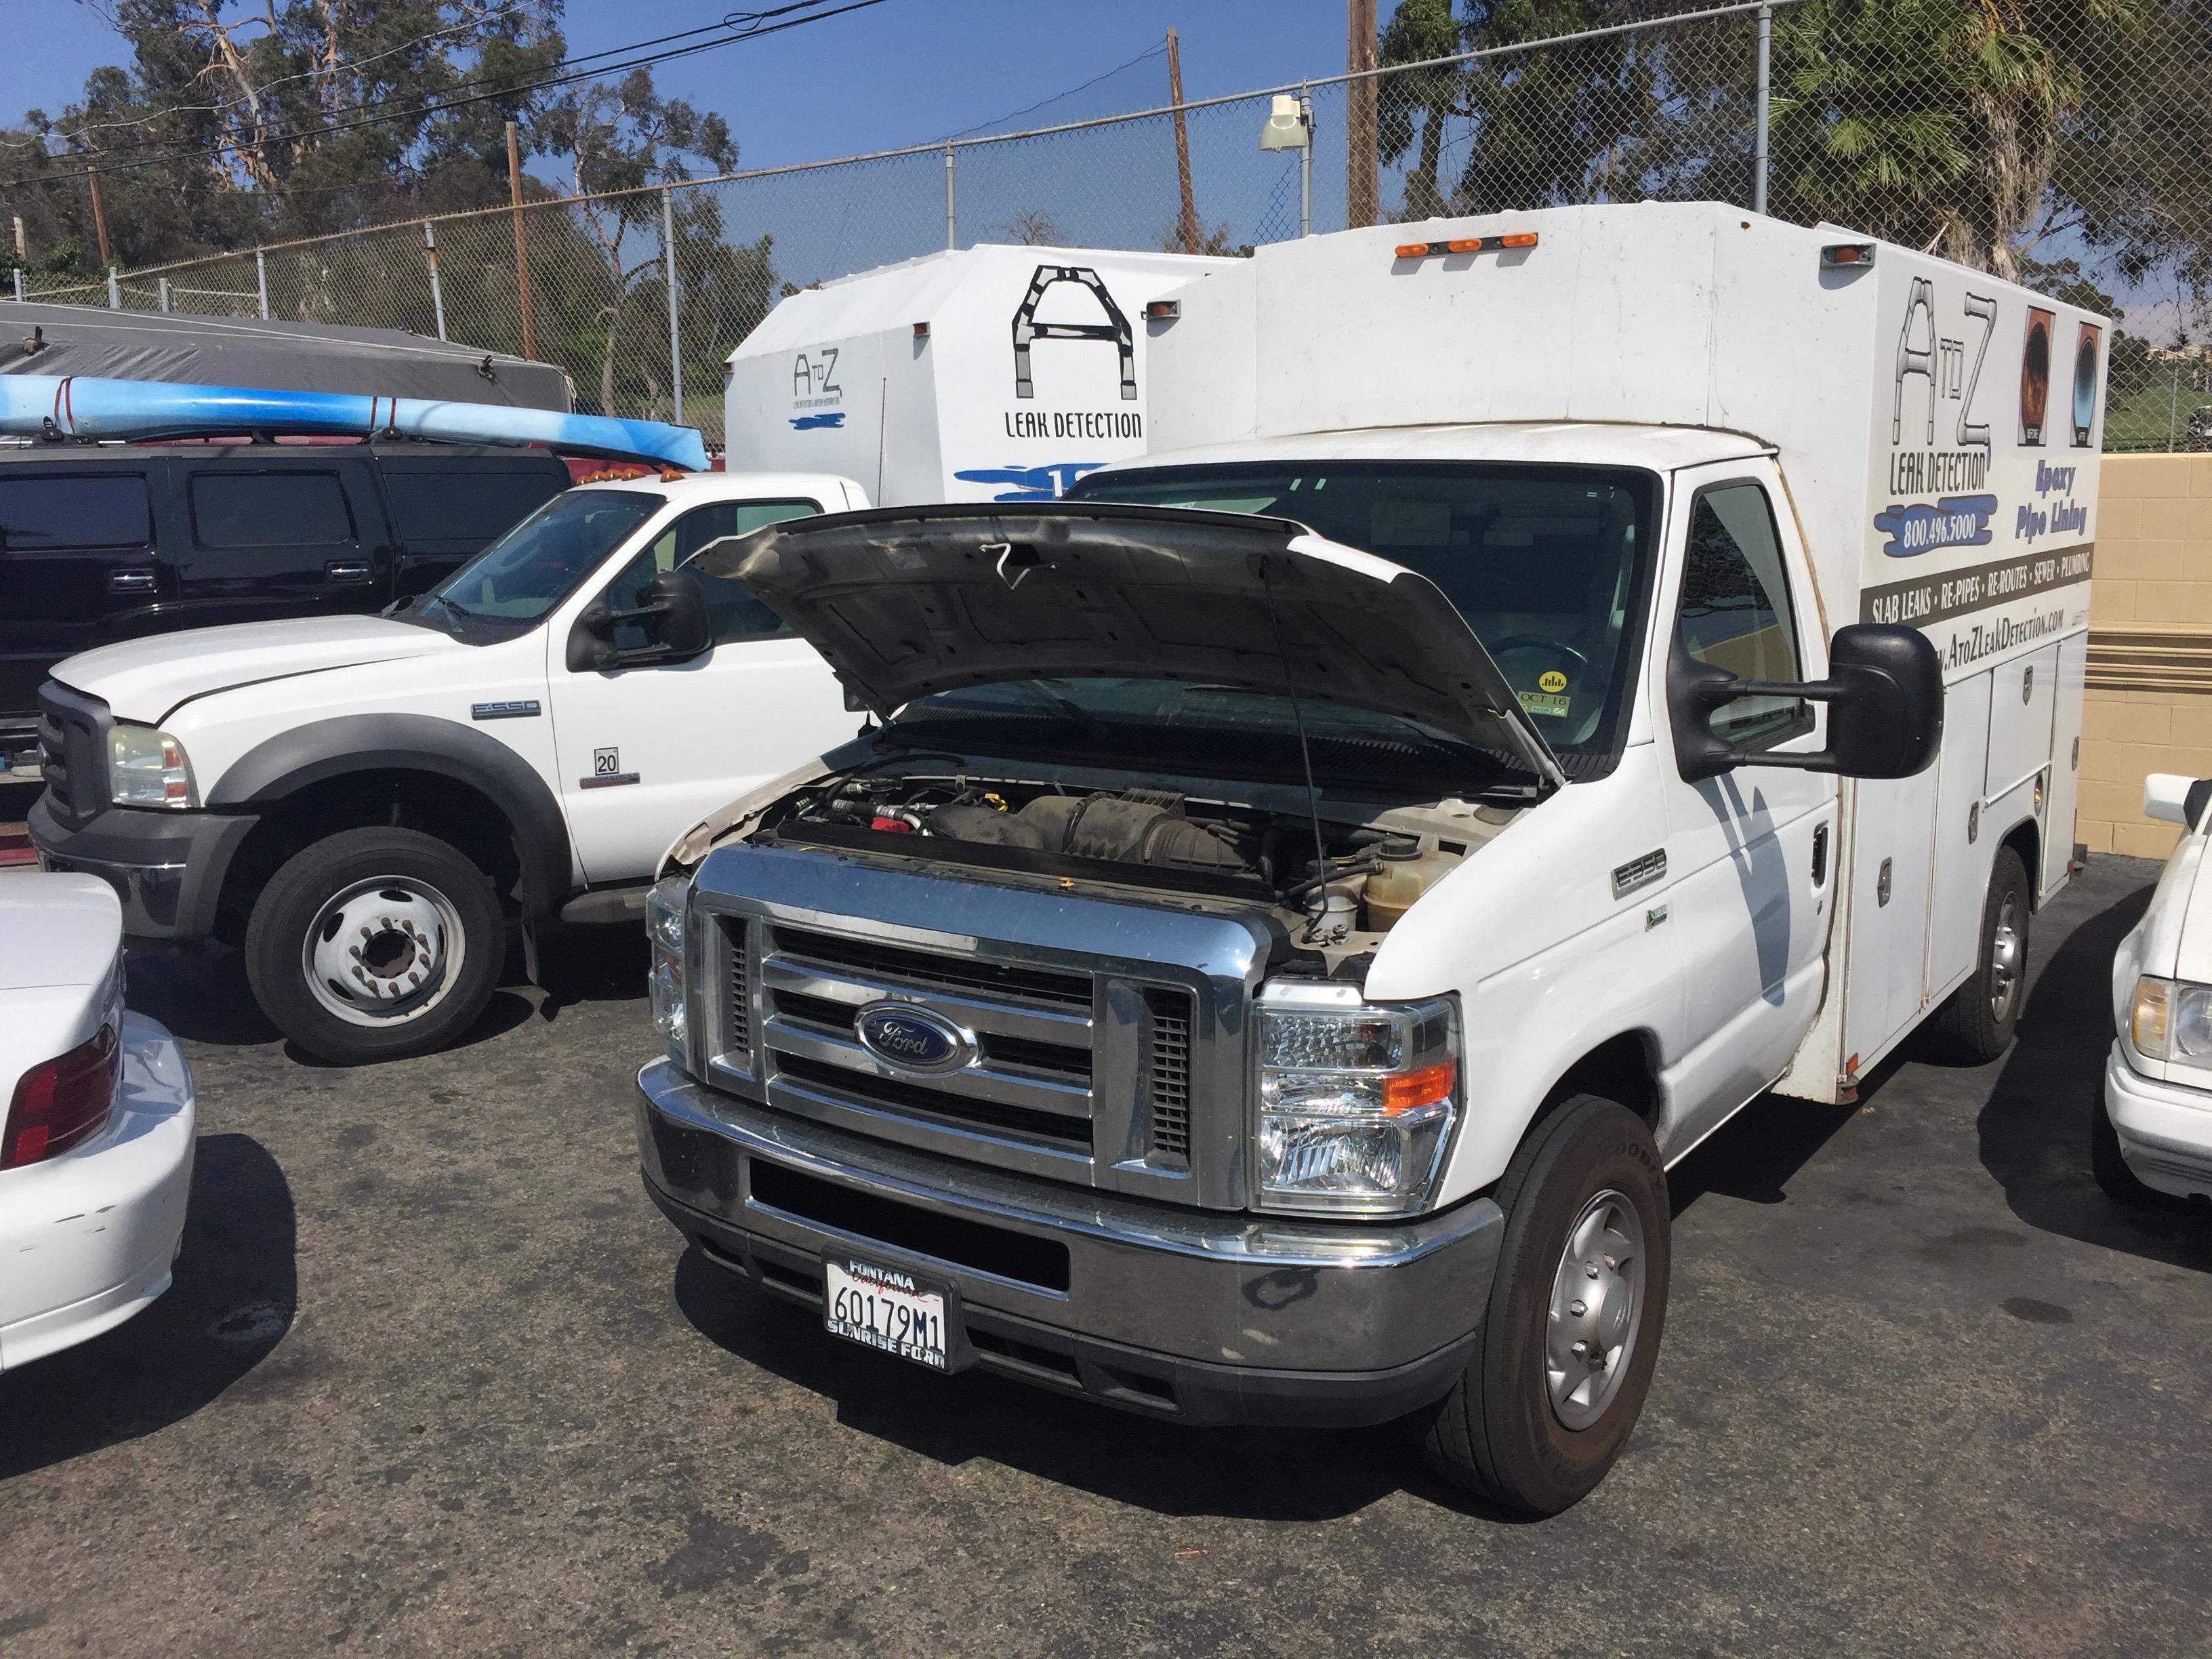 fleet service and repair san clemente ca | San Clemente Auto Center